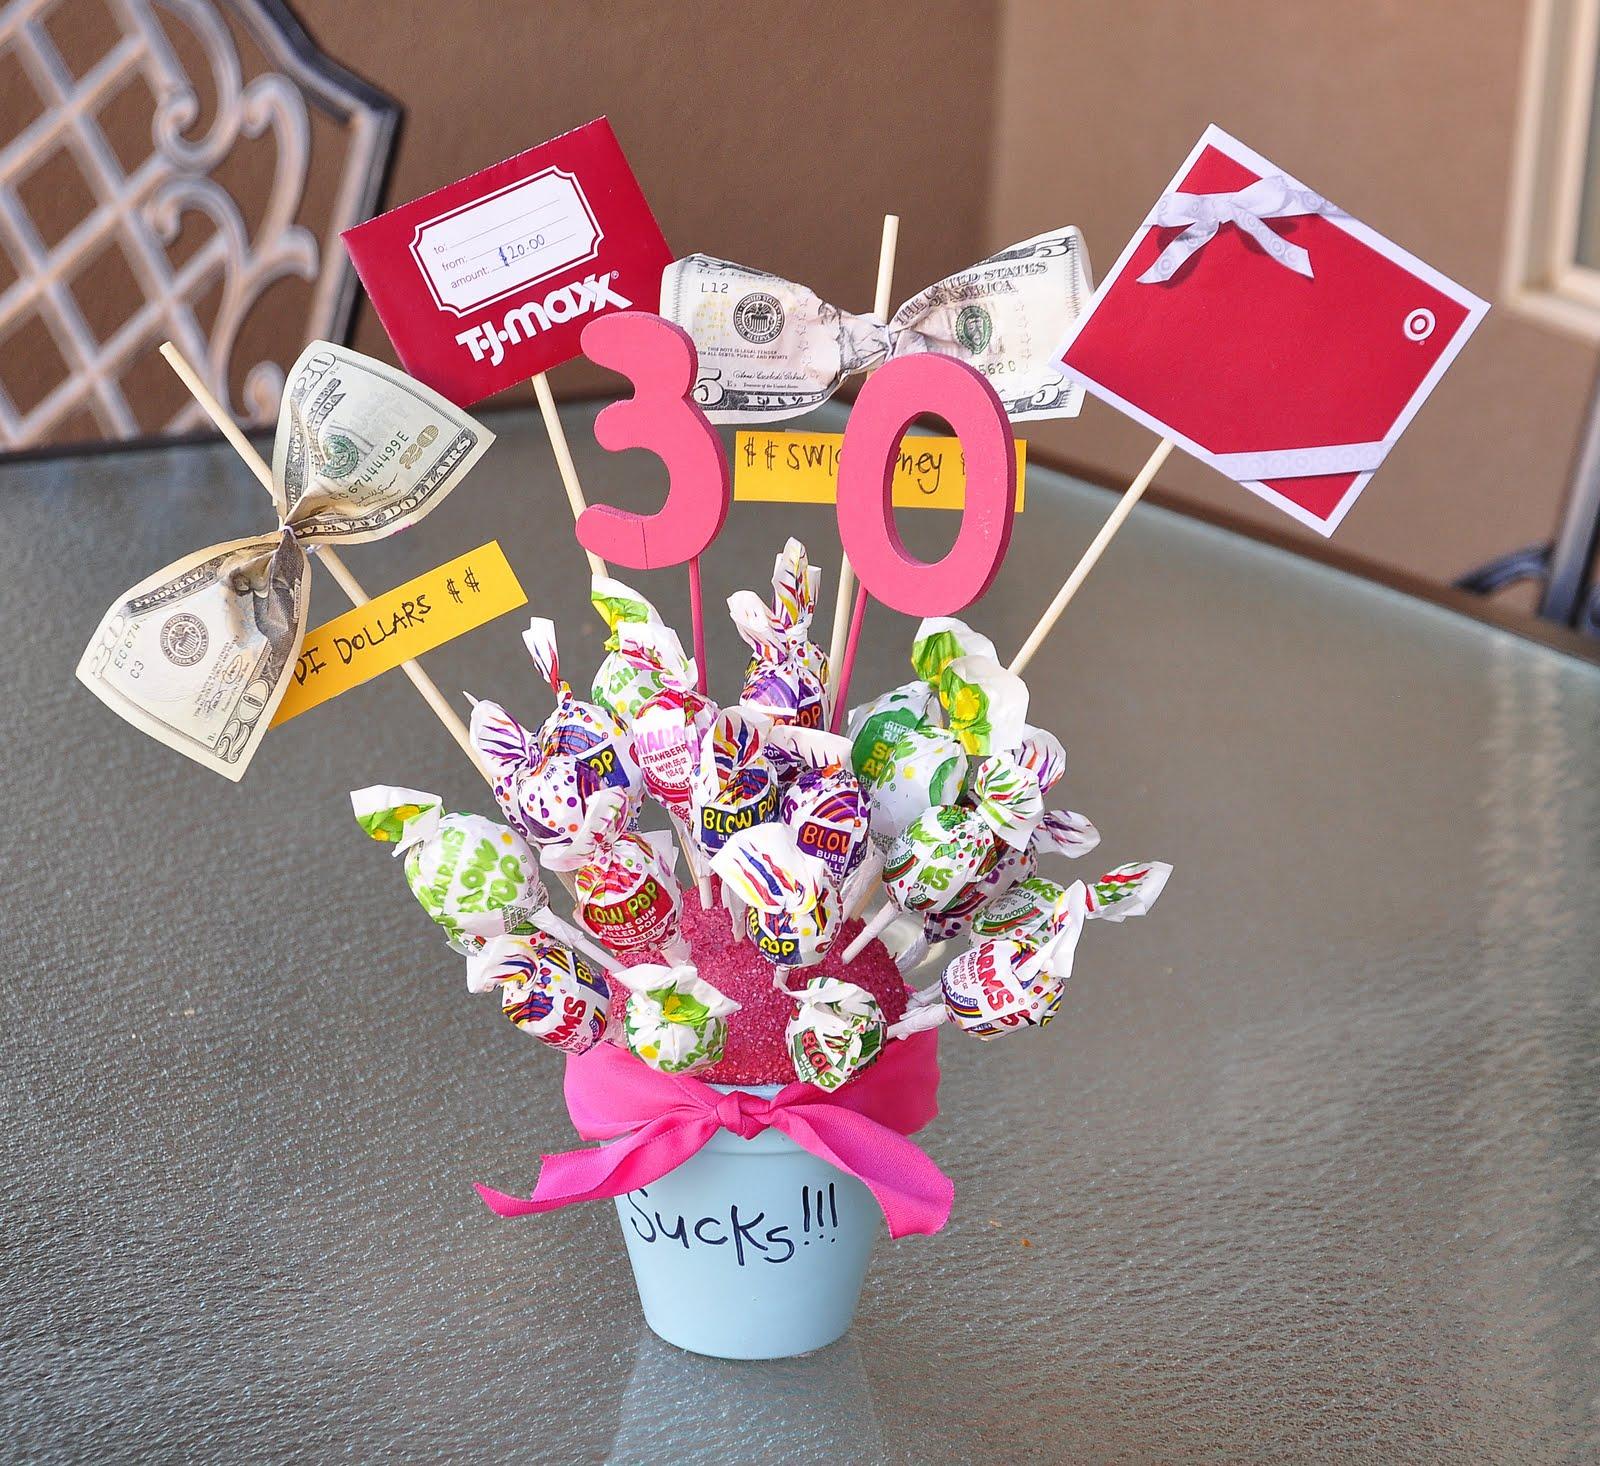 30th Birthday Party SaveEnlarge Best Friend Gift Ideas